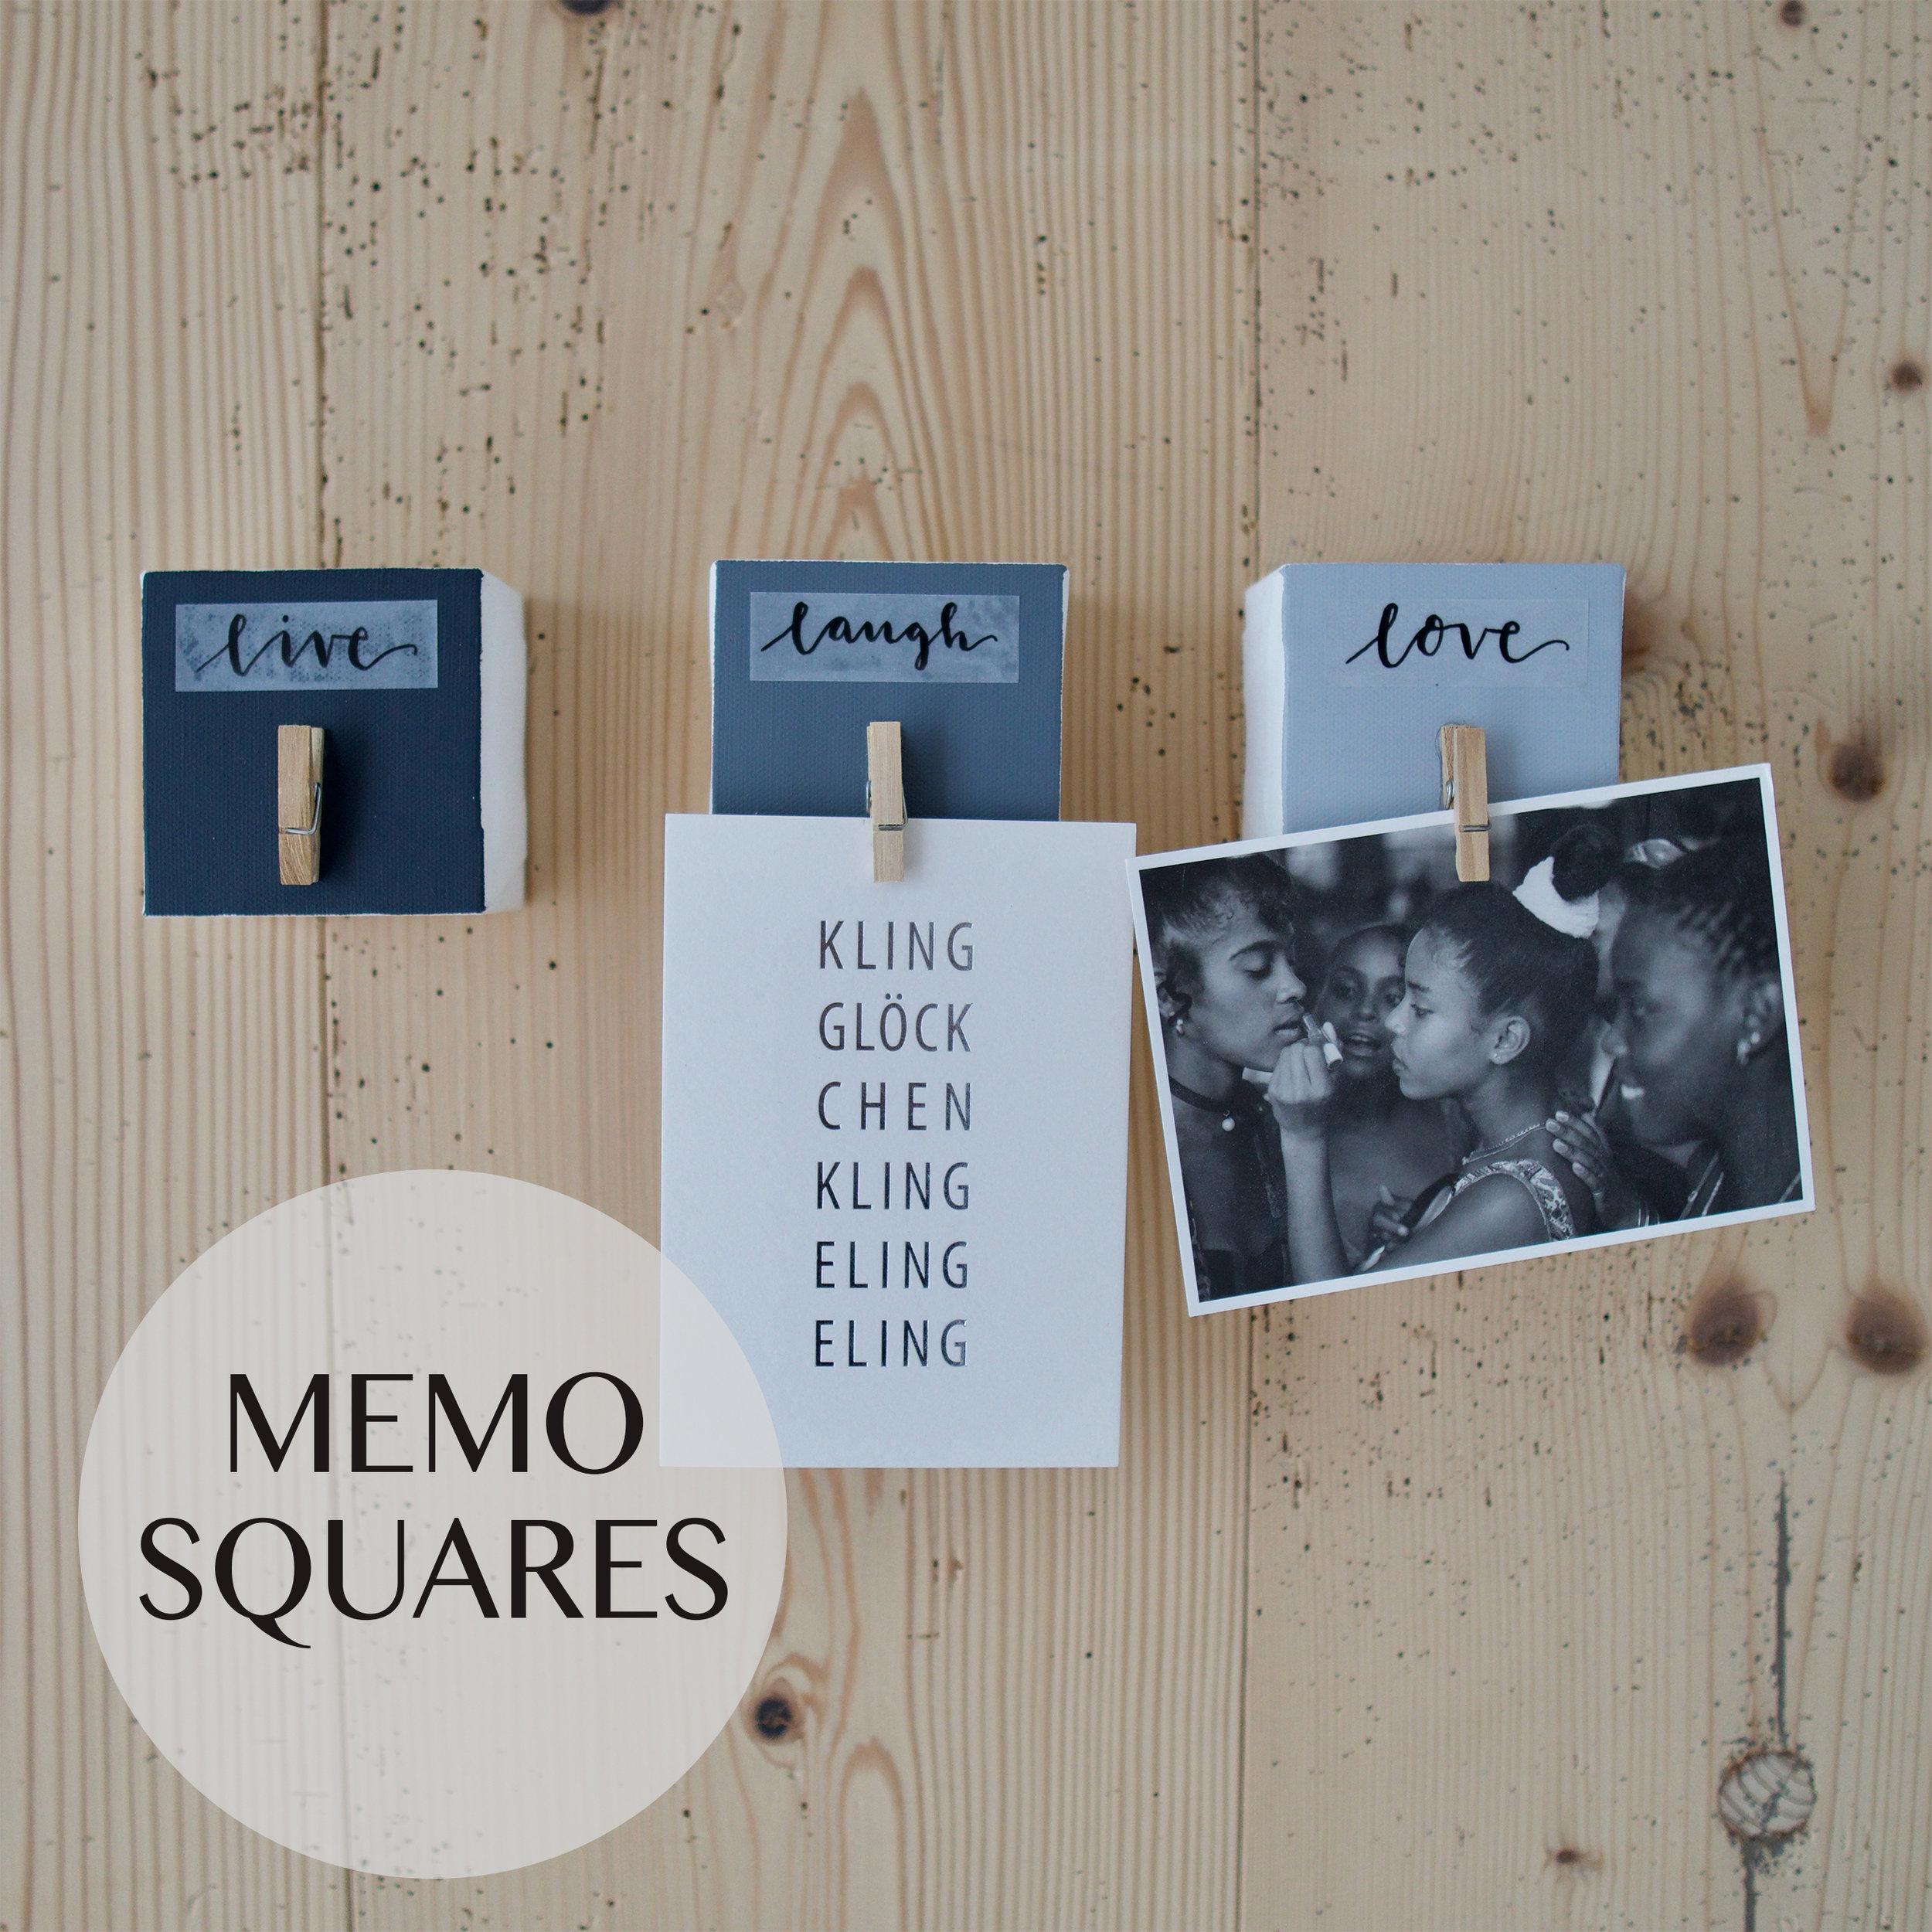 Memo Squares.jpg